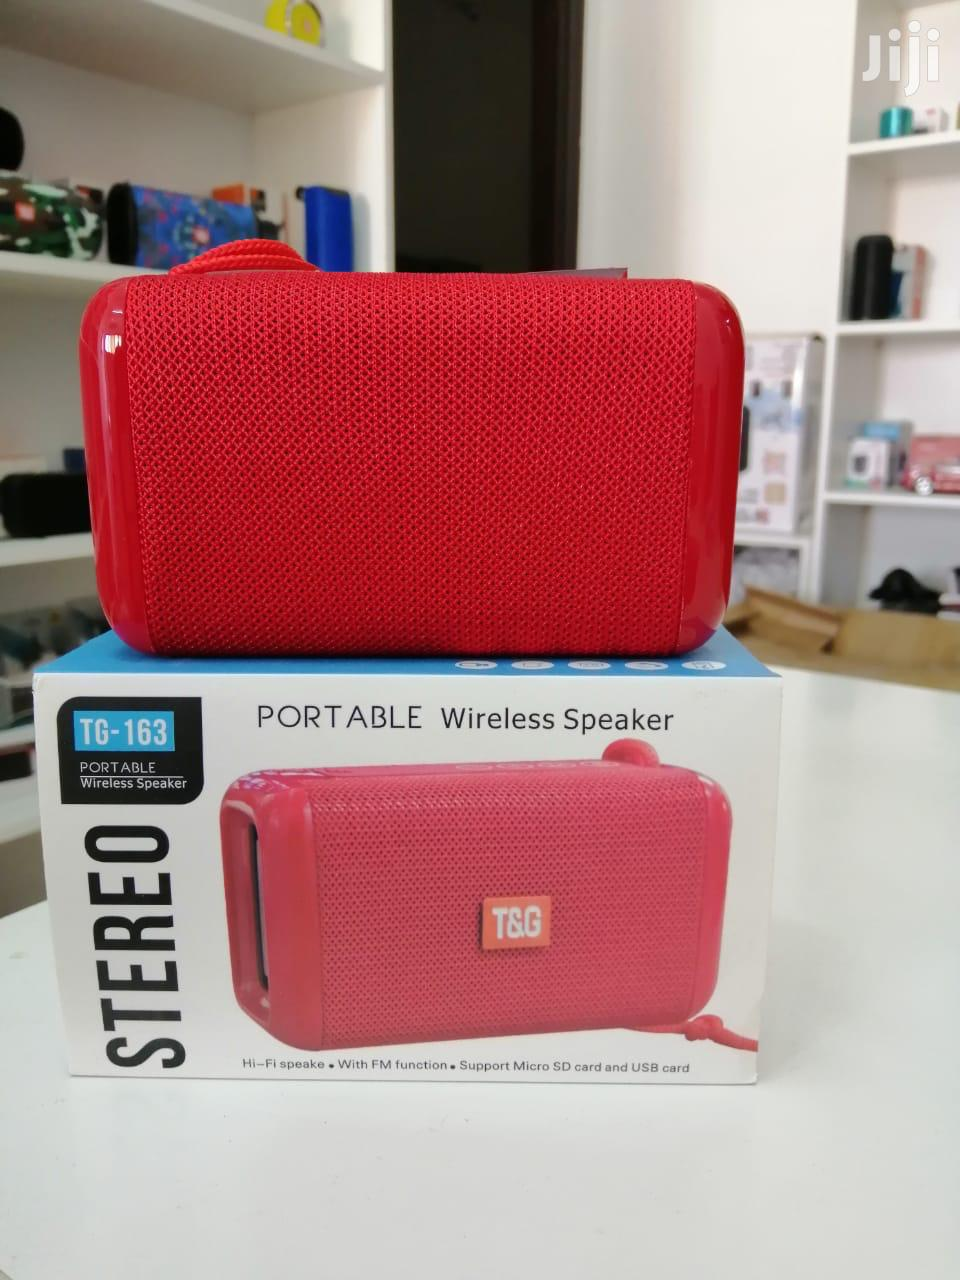 Archive: Nextstern TG 163 Wireless Portable Bluetooth Mobile Speaker